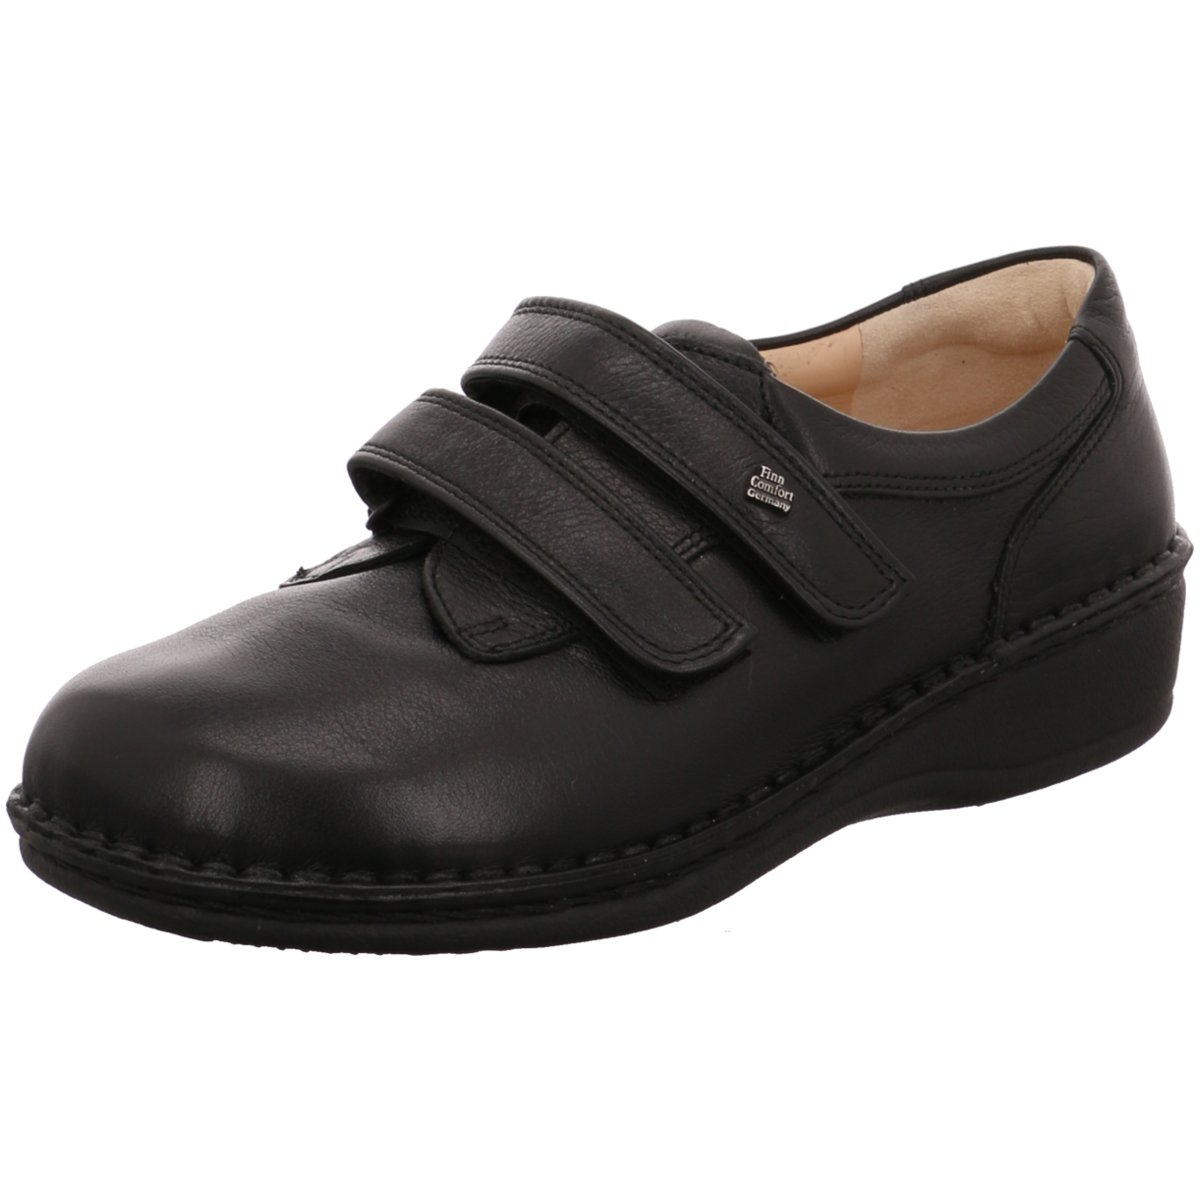 NEU FinnComfort Damen Slipper Prophylaxe Schuh 96102 schwarz schwarz 169627